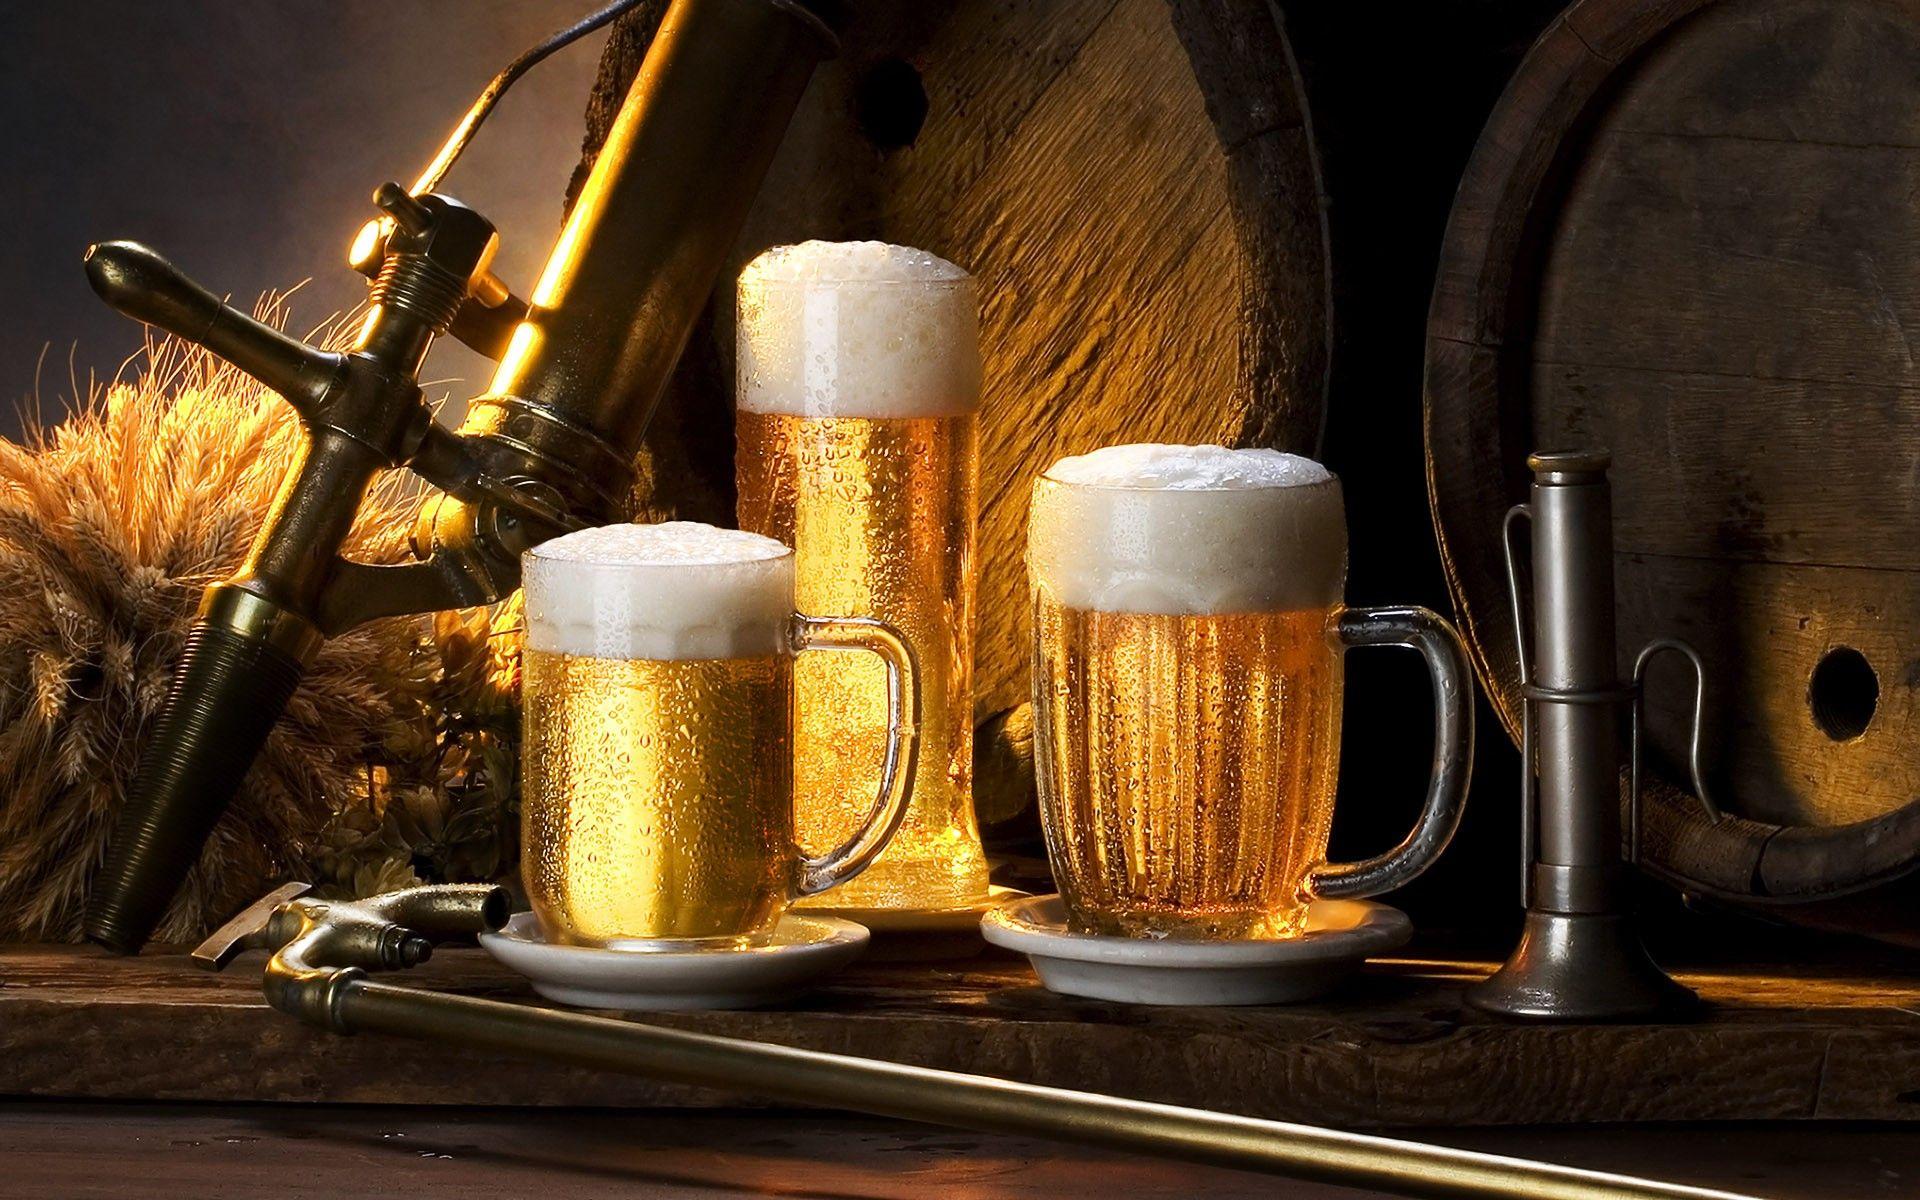 Mobile And Desktop Wallpaper Hd Beer Beer Bar Beer Ad